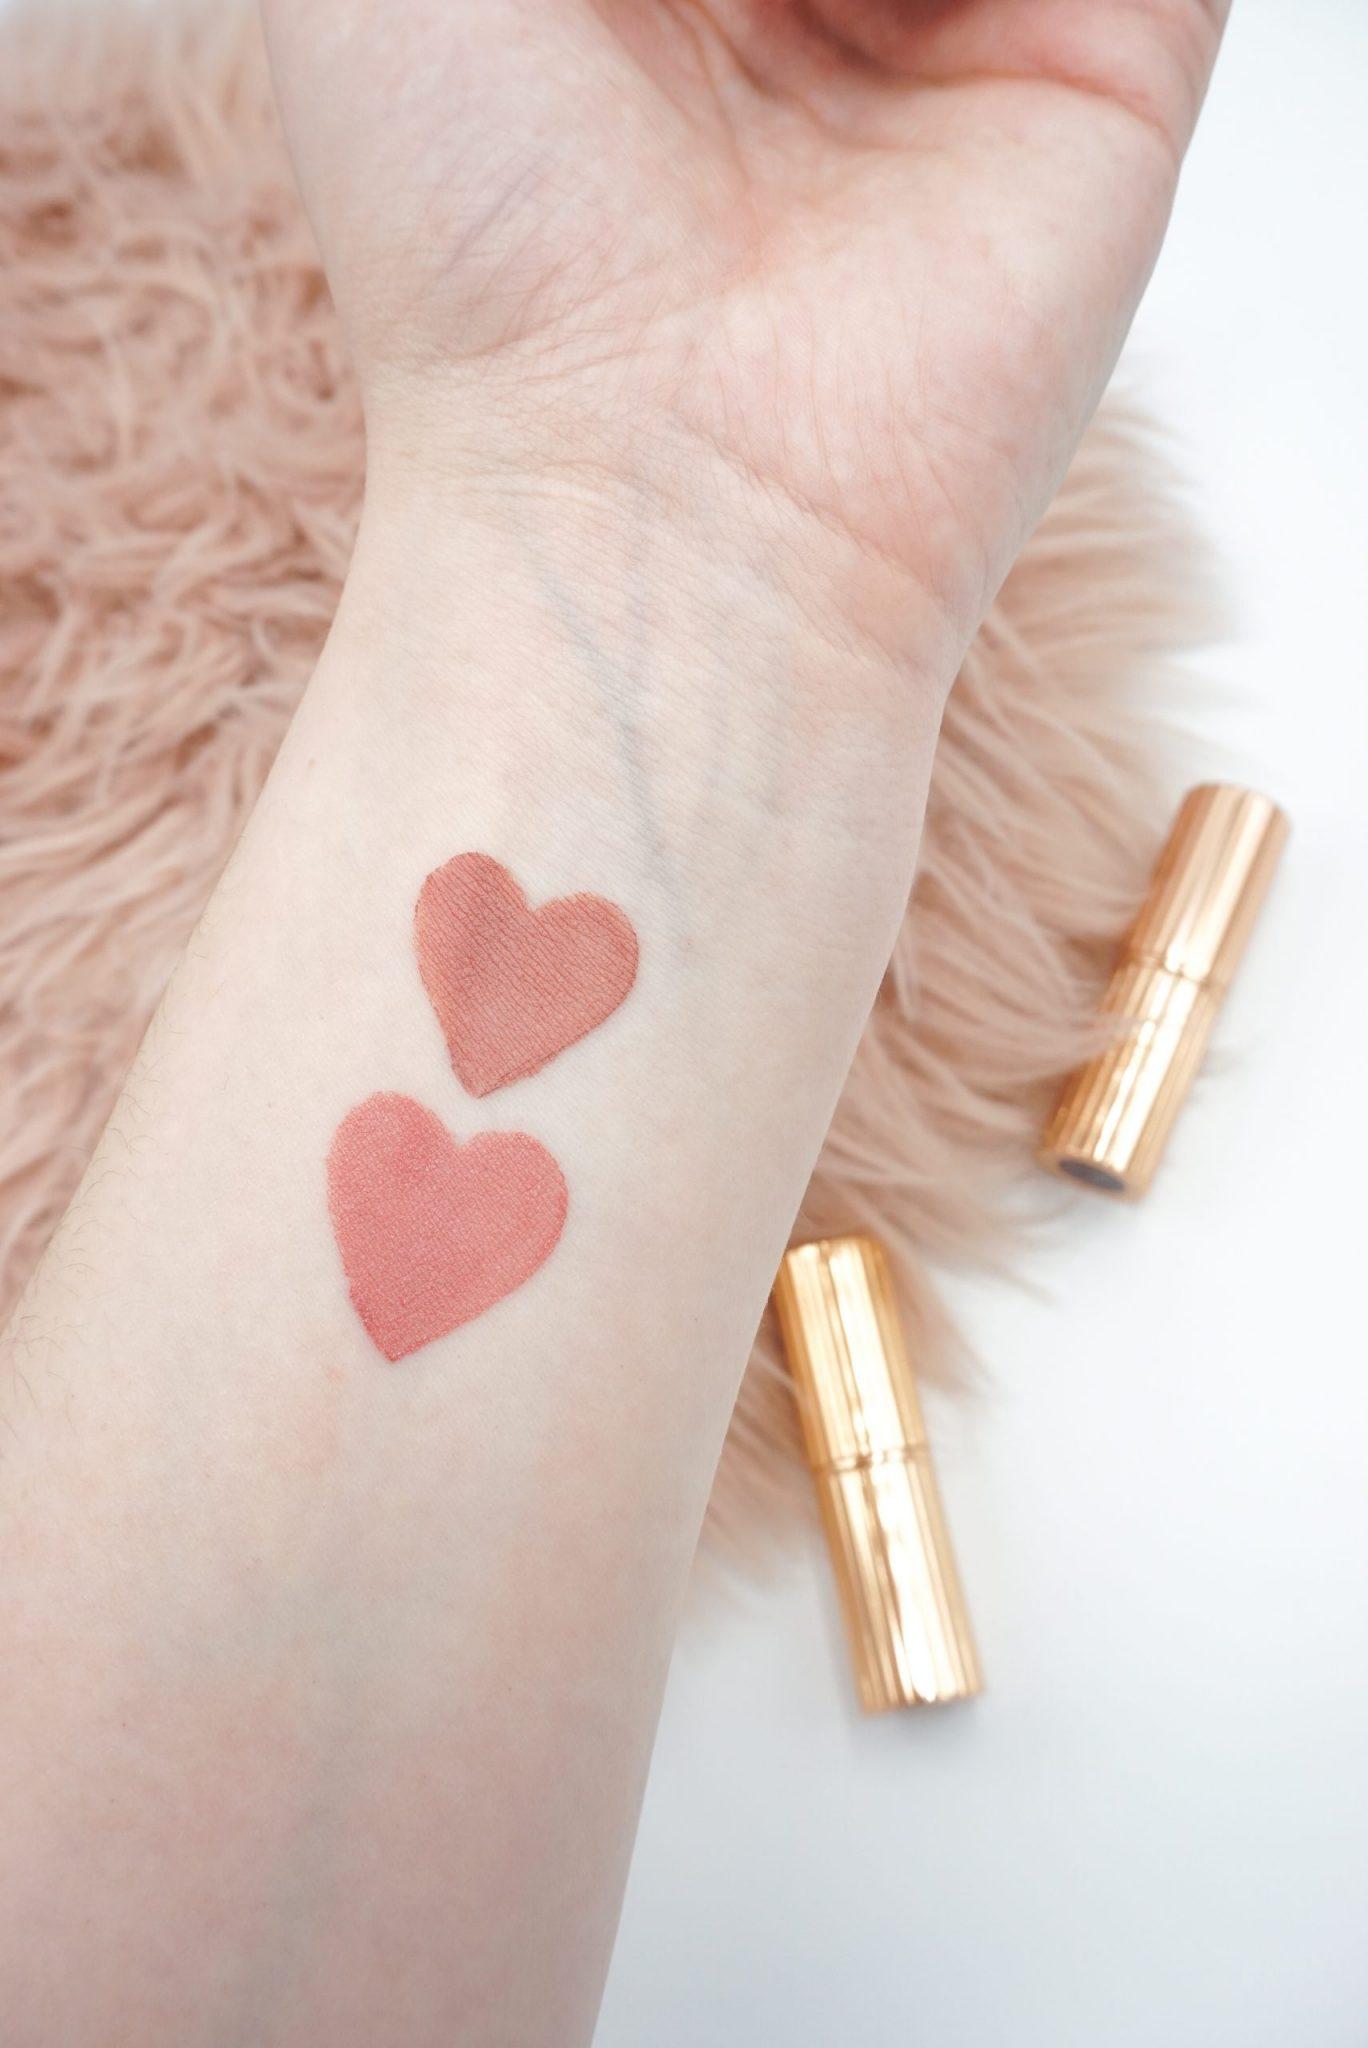 Charlotte Tilbury Pillow Talk and The Duchess Lipsticks Review ⋆ Beautymone